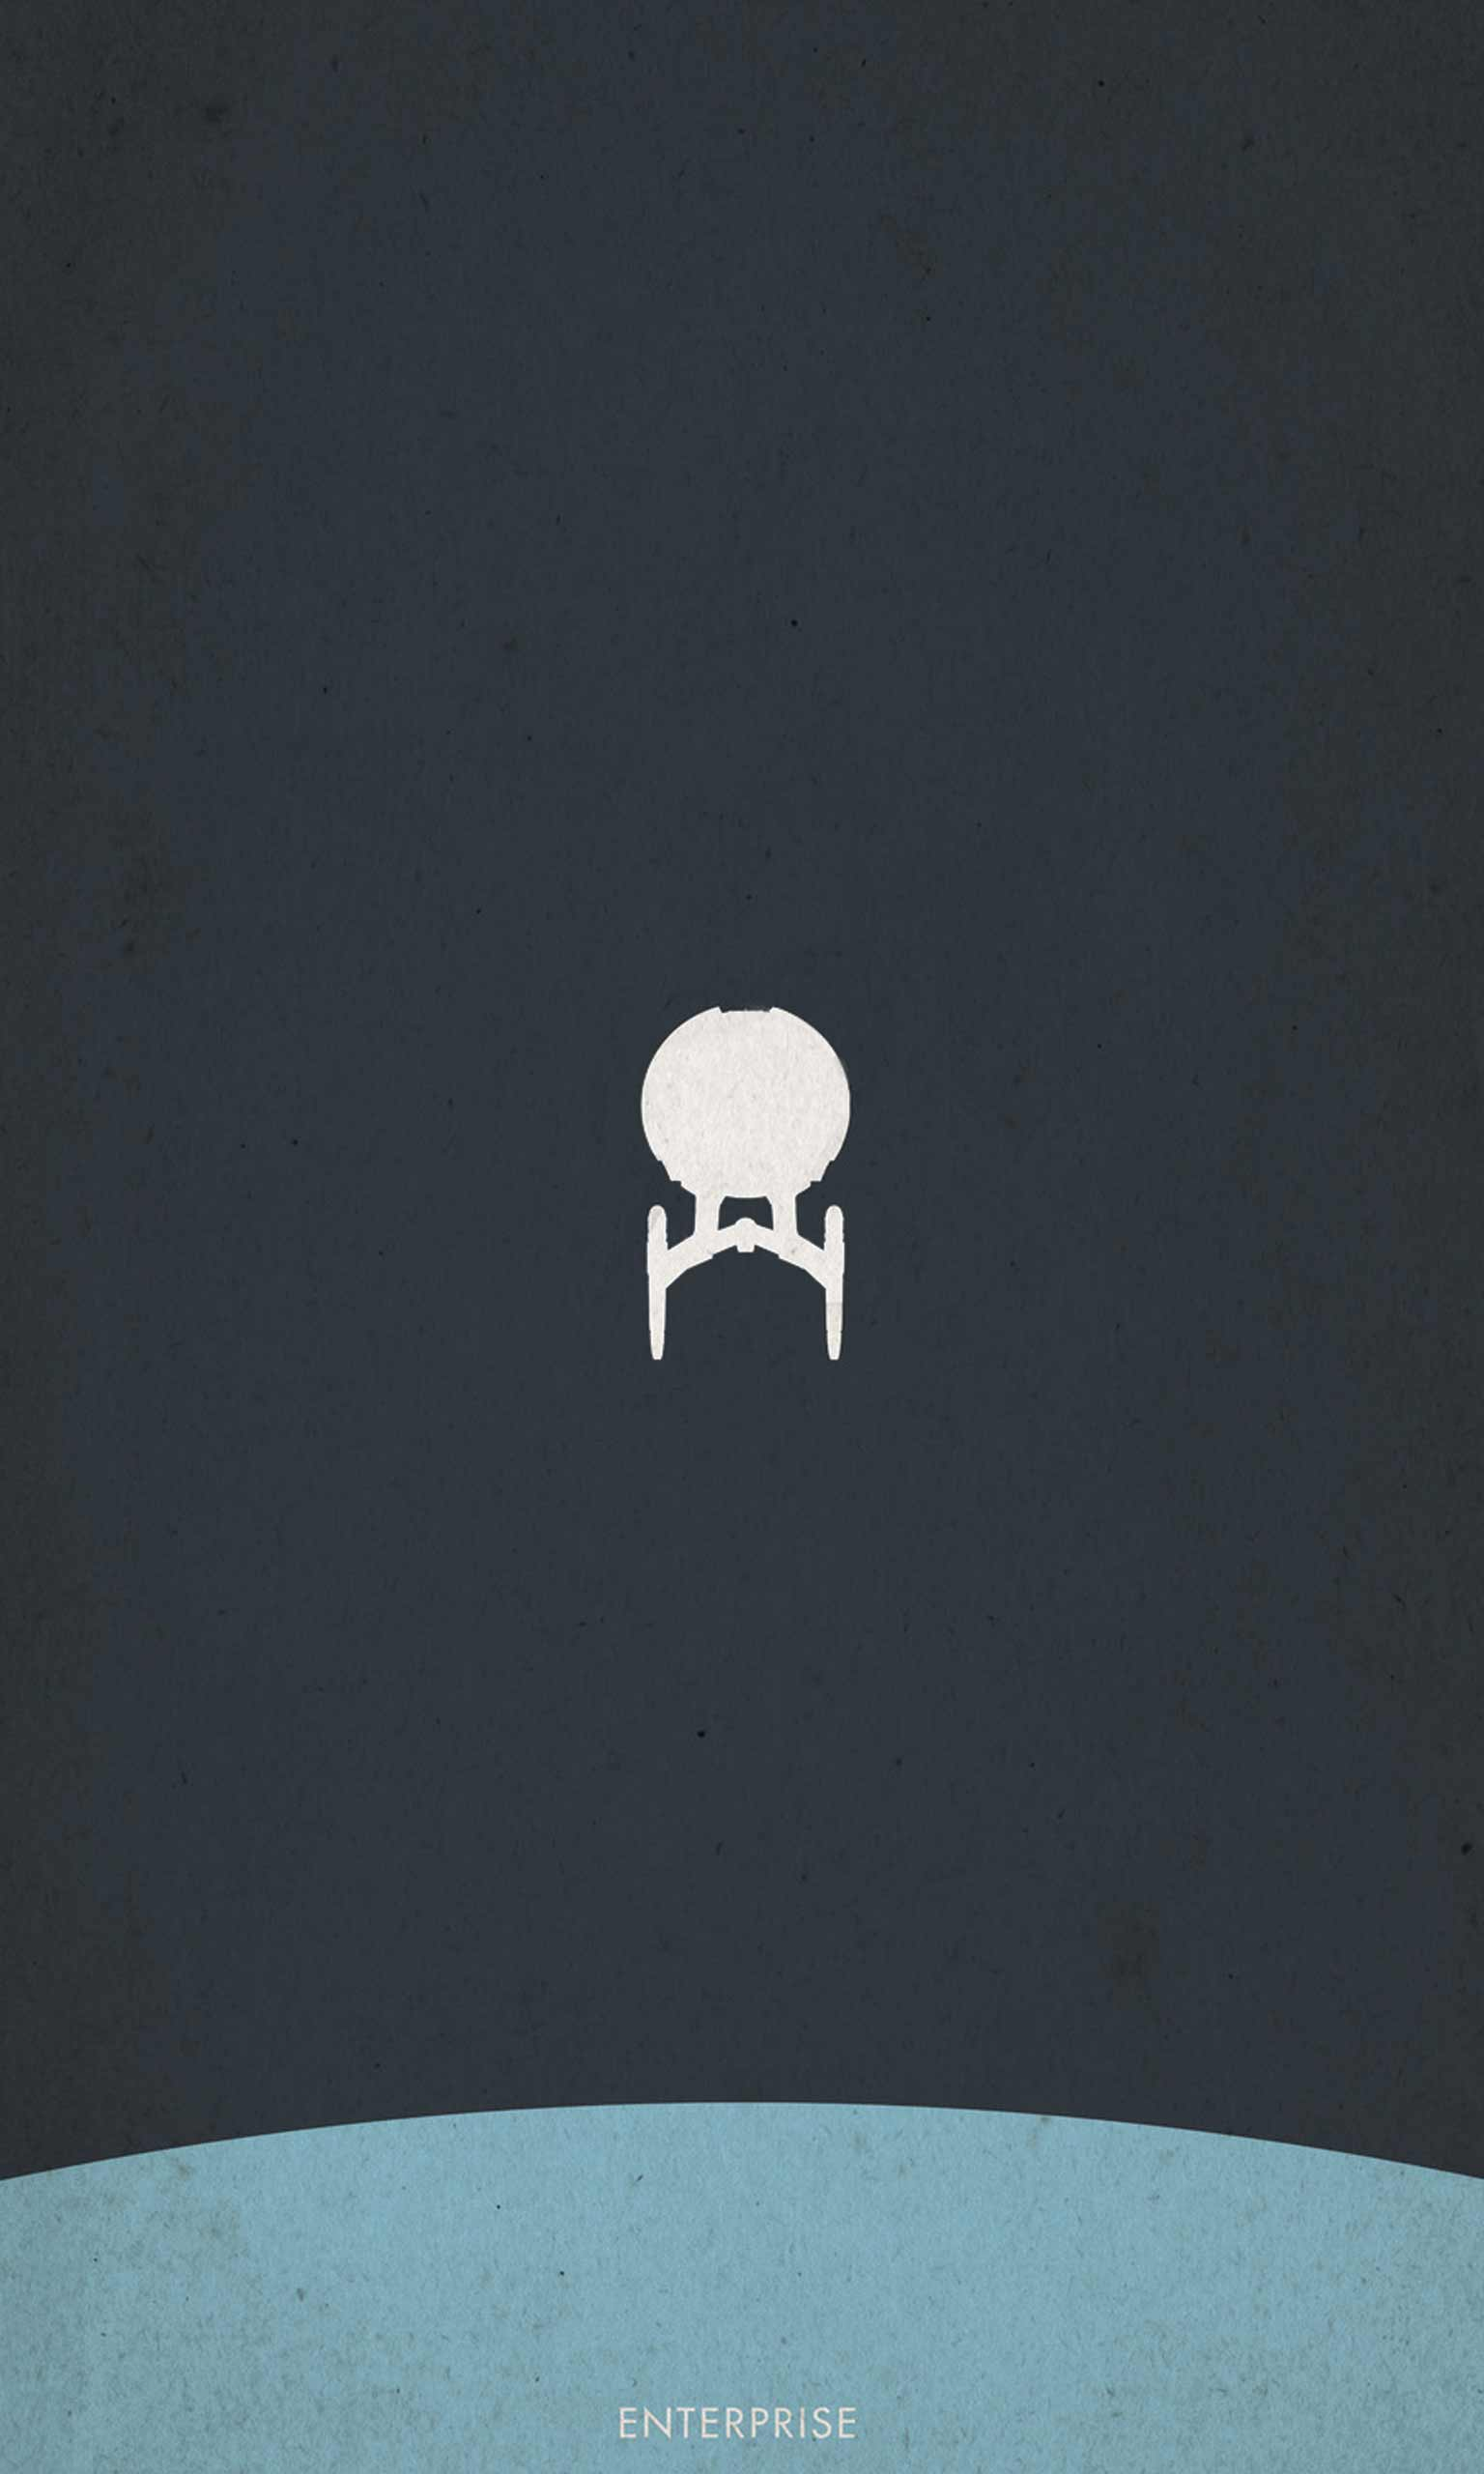 Must see Wallpaper Logo Huawei - star-trek-enterprise-mobile-wallpaper-minimalist-1536x2560  Collection_172553.jpg